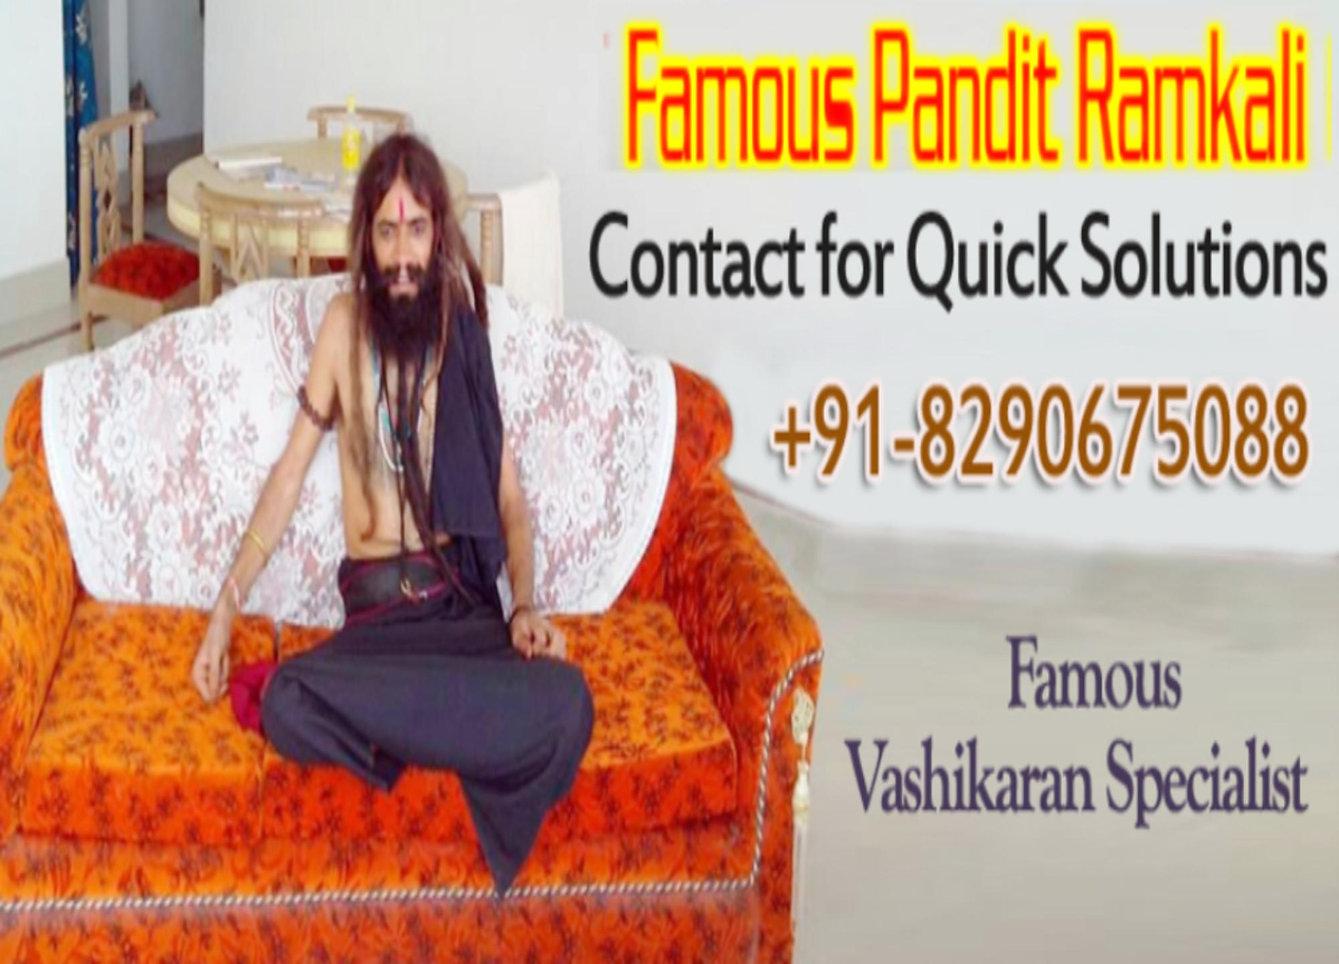 Vashikaran-Specialist-Pandit (3).jpg